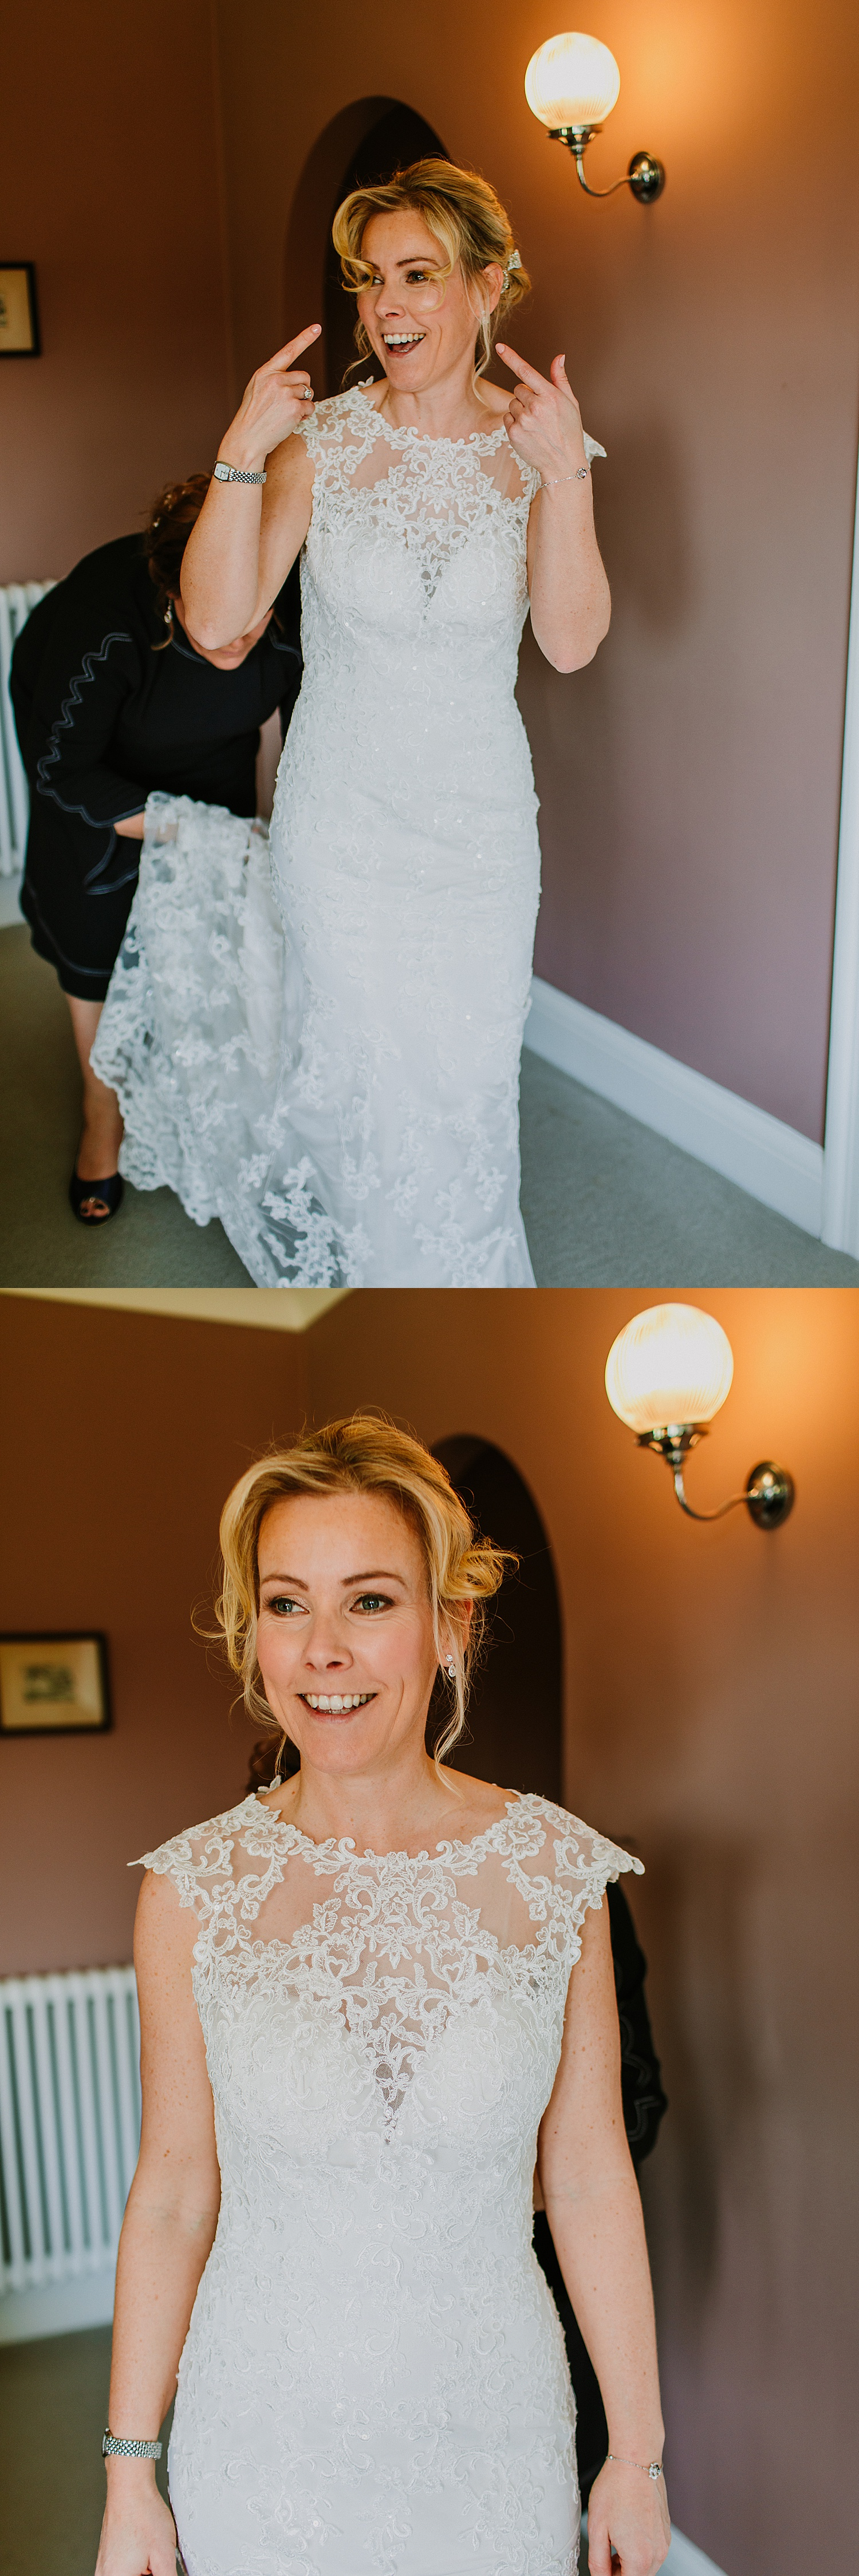 Burley Manor Wedding9.jpg